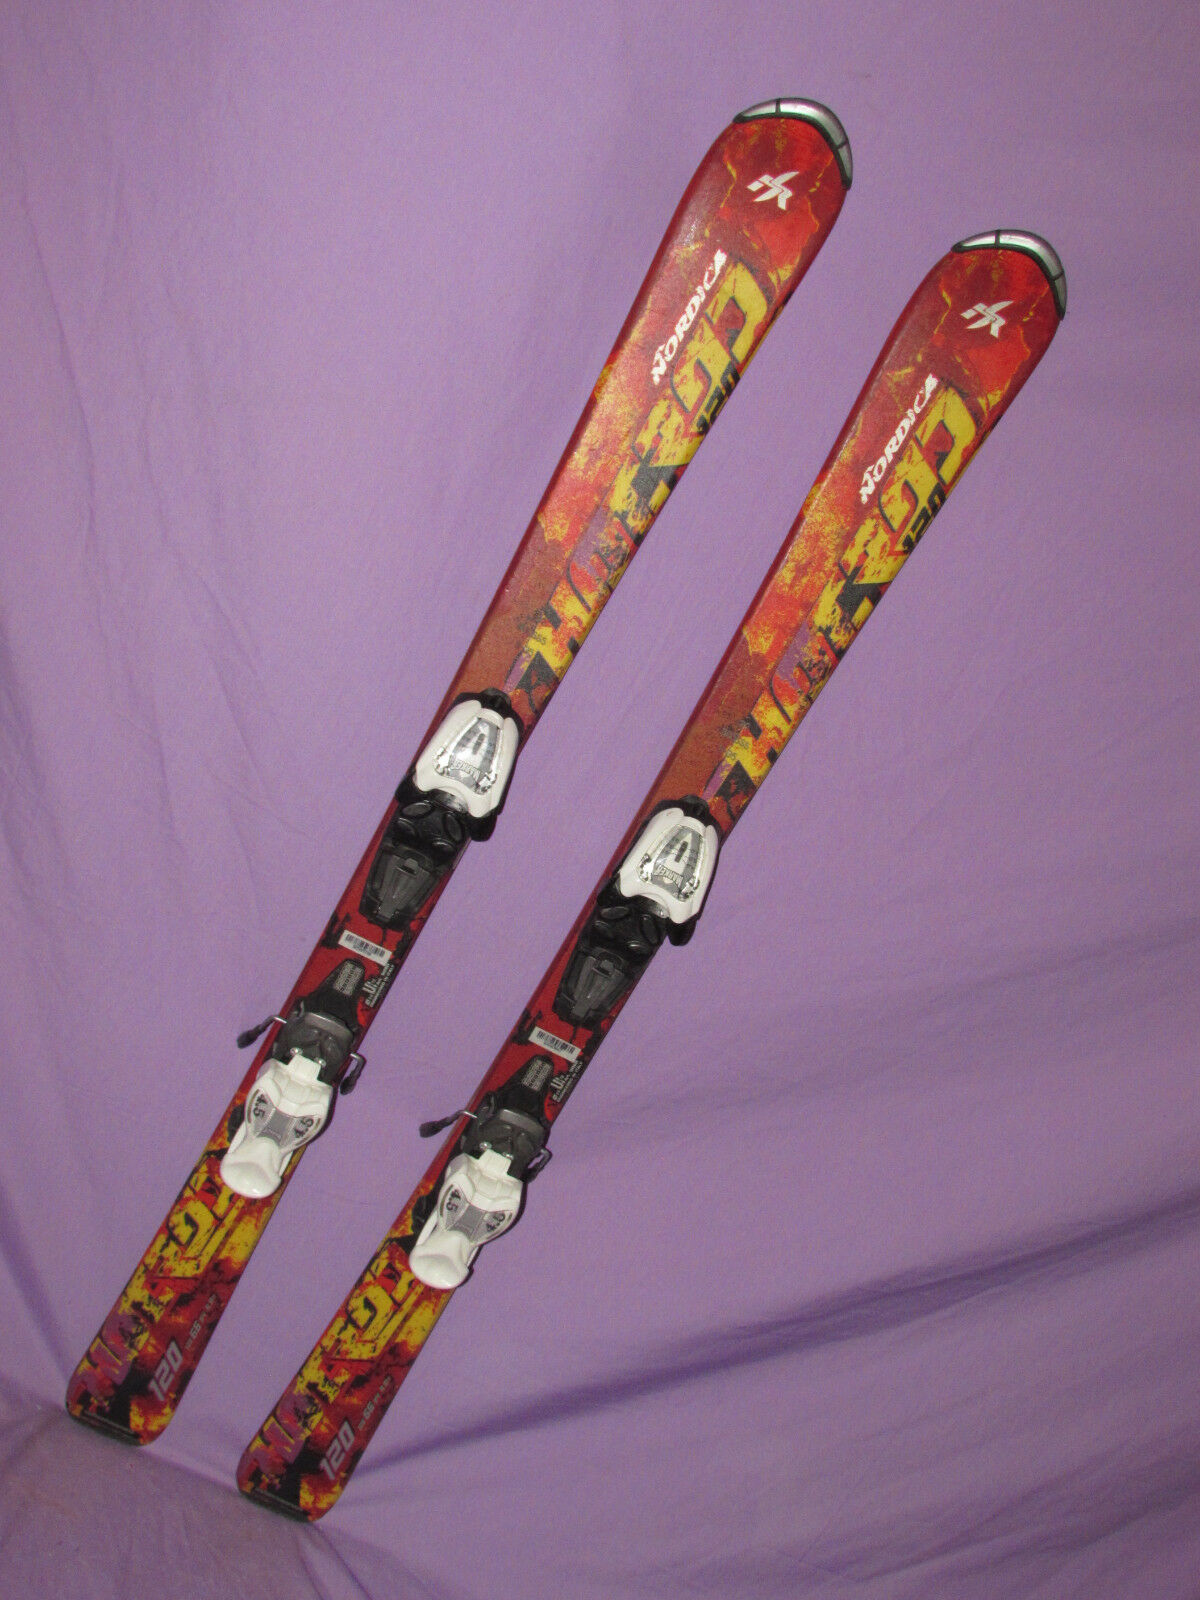 Nordica HOT ROD Jr. Kids SKIS 120cm w  Marker 4.5 Demo Adjustable ski Bindings